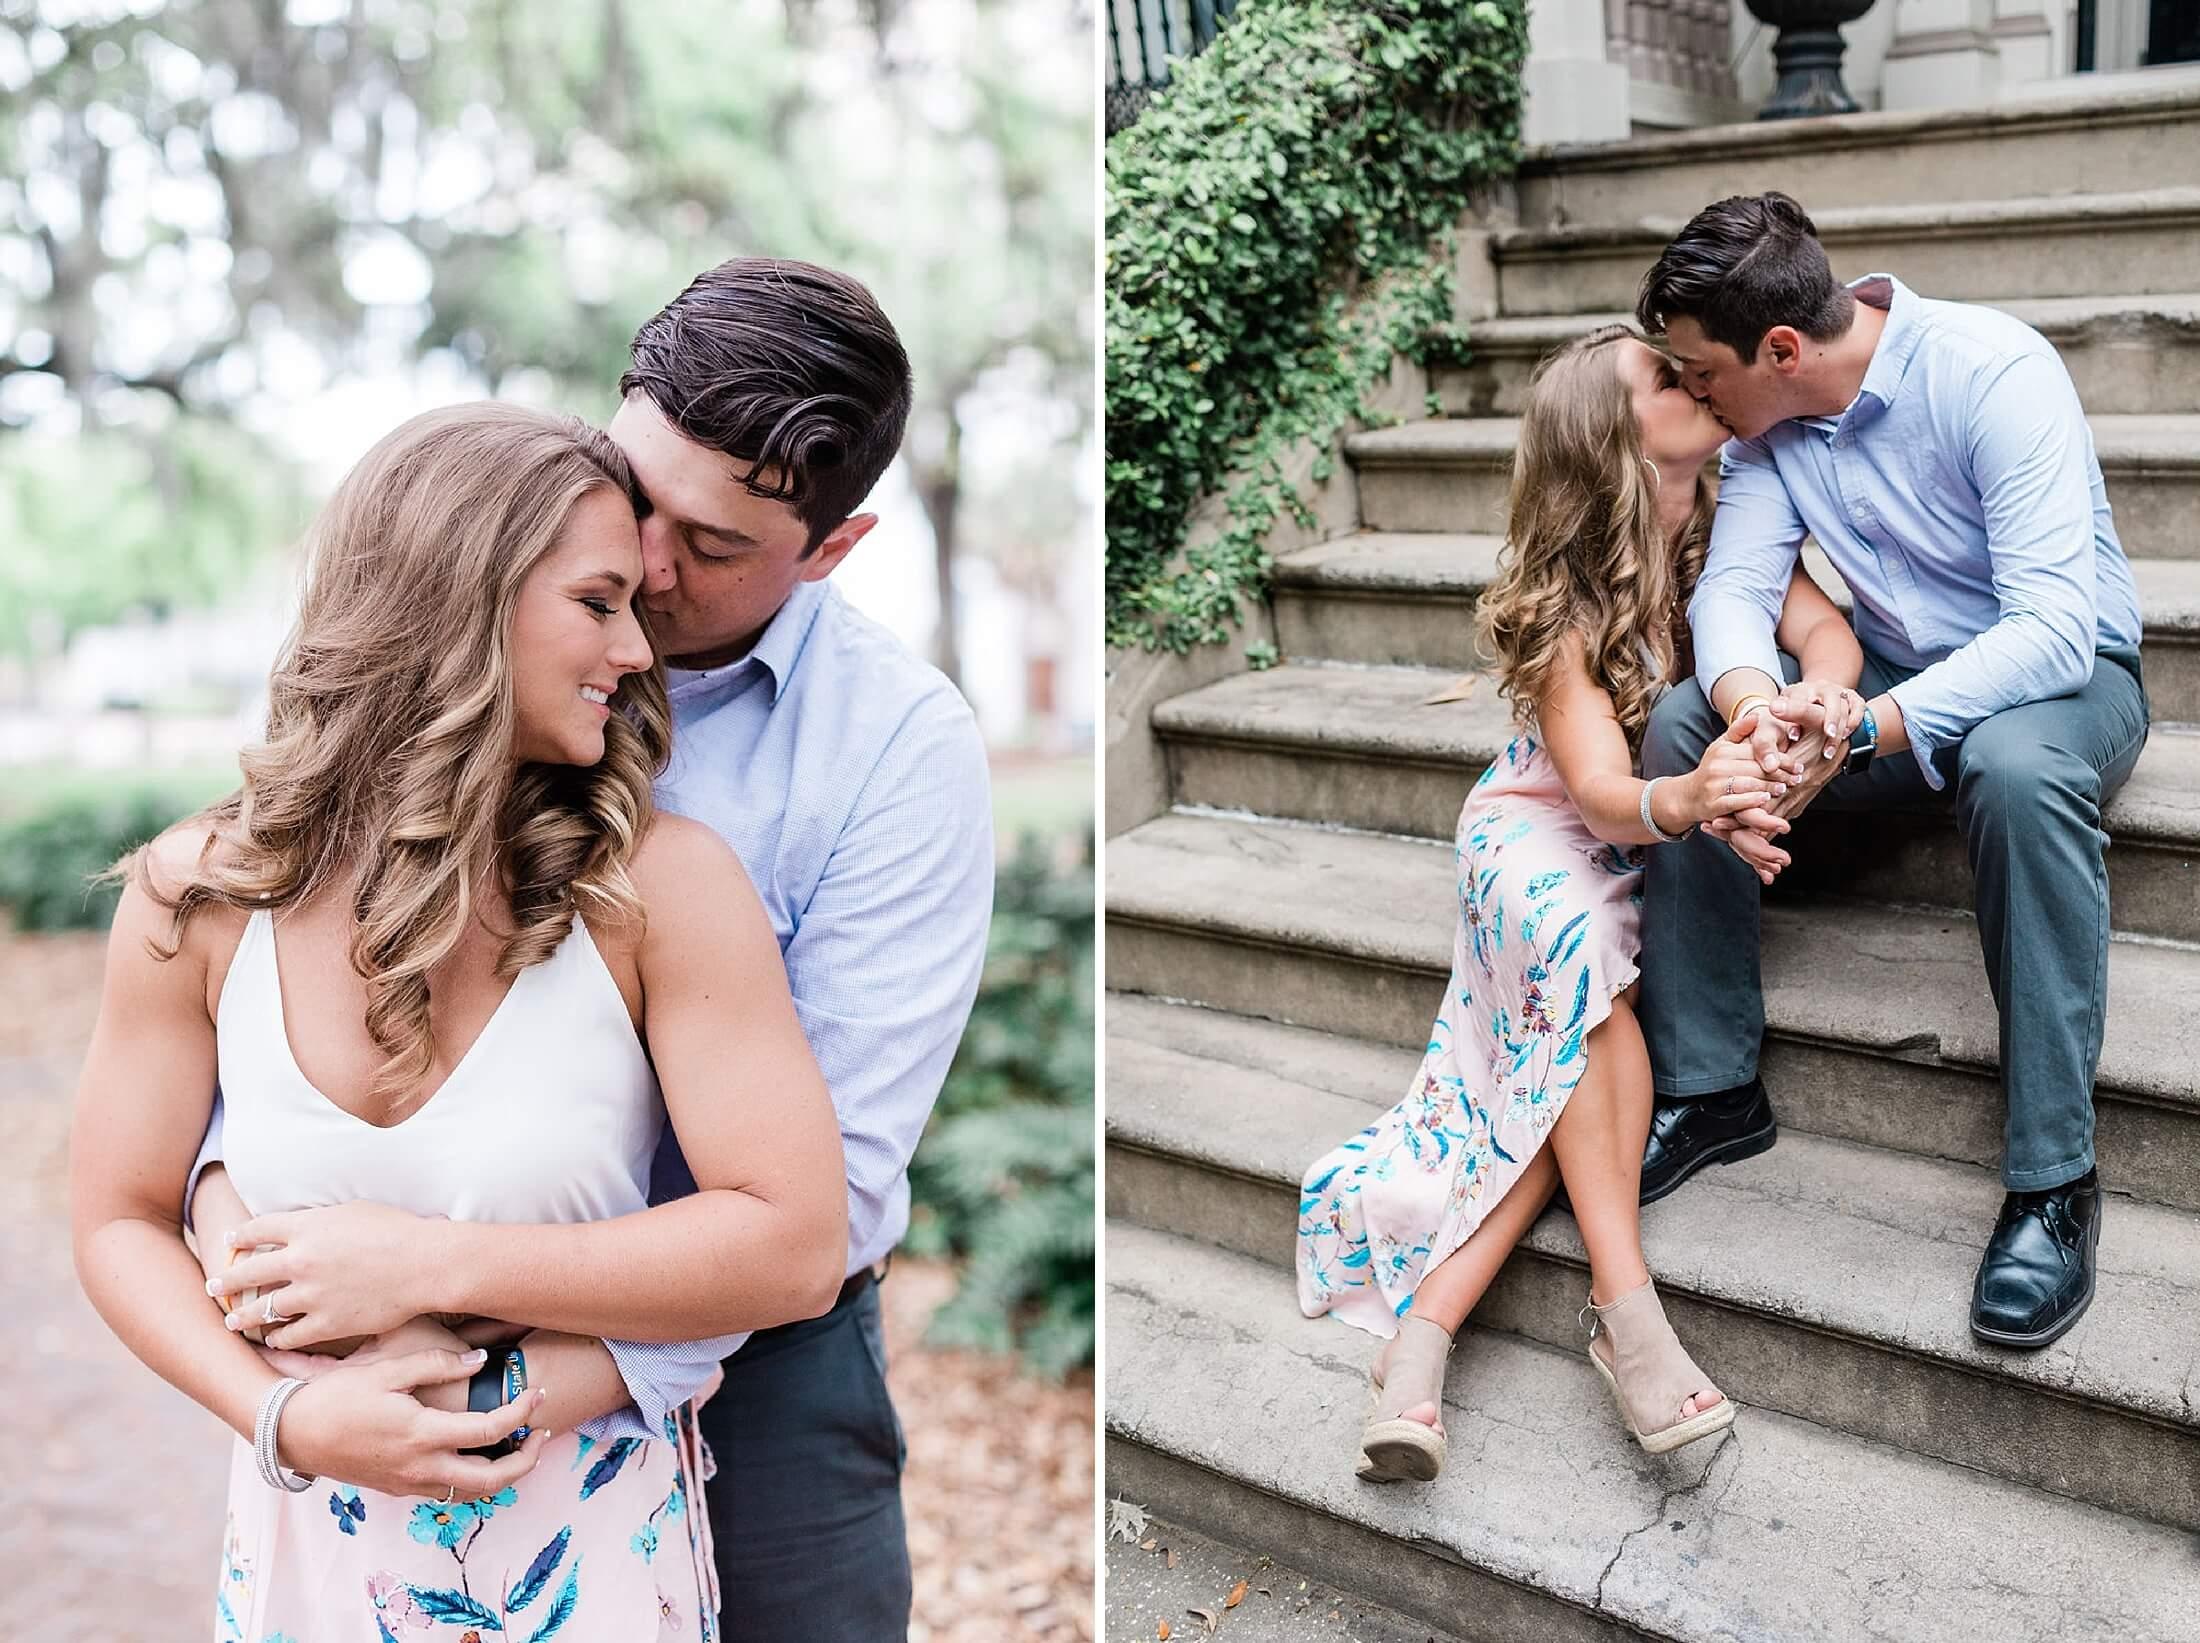 Apt-b-photography-savannah-engagement-photographer-savannah-wedding-hilton-head-elopement-savannah-wedding-photographer-4.jpg